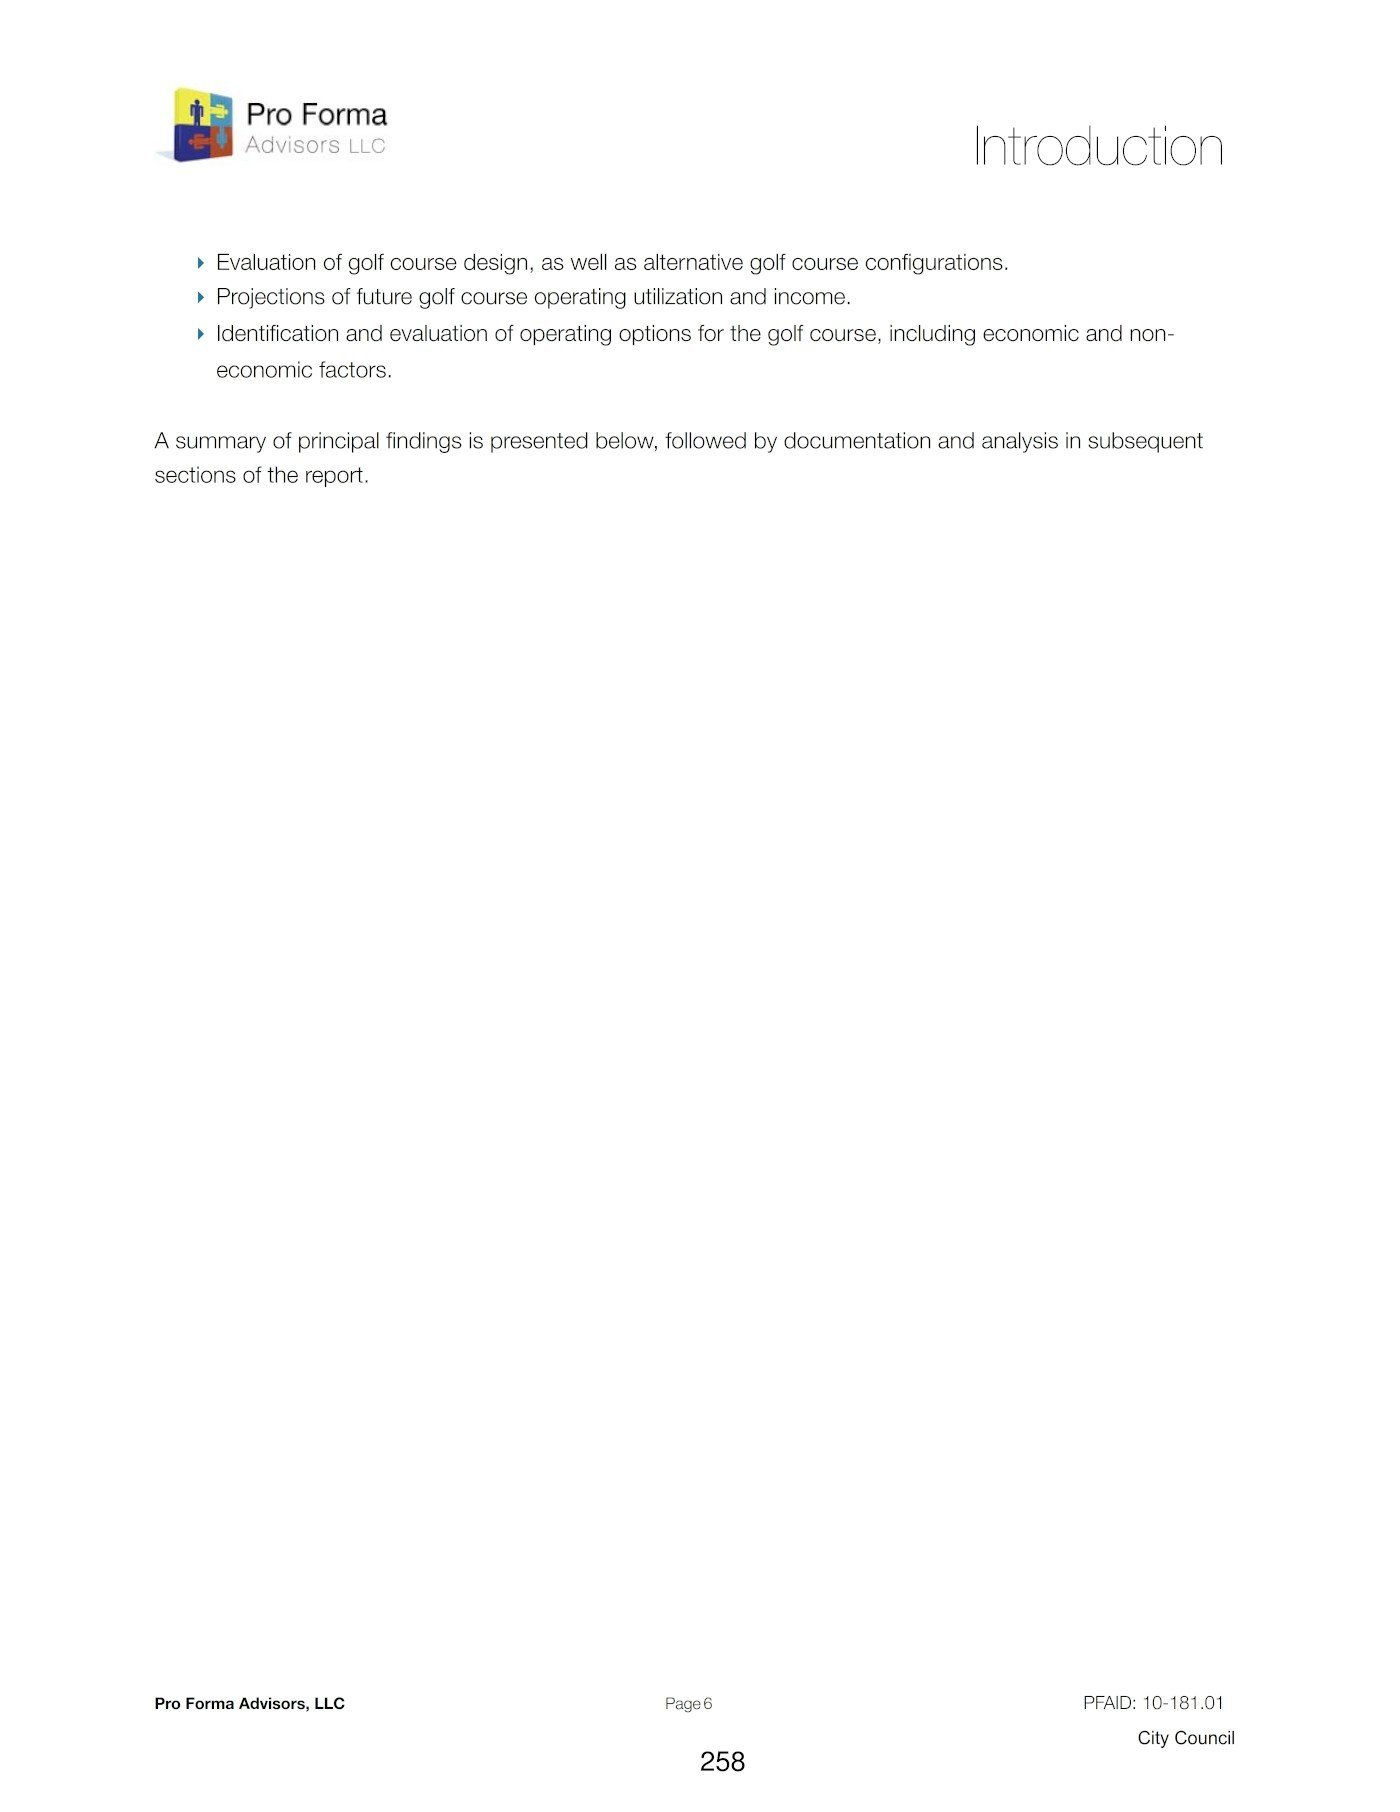 Hesperia Golf Analysis - Introduction 2 of 2